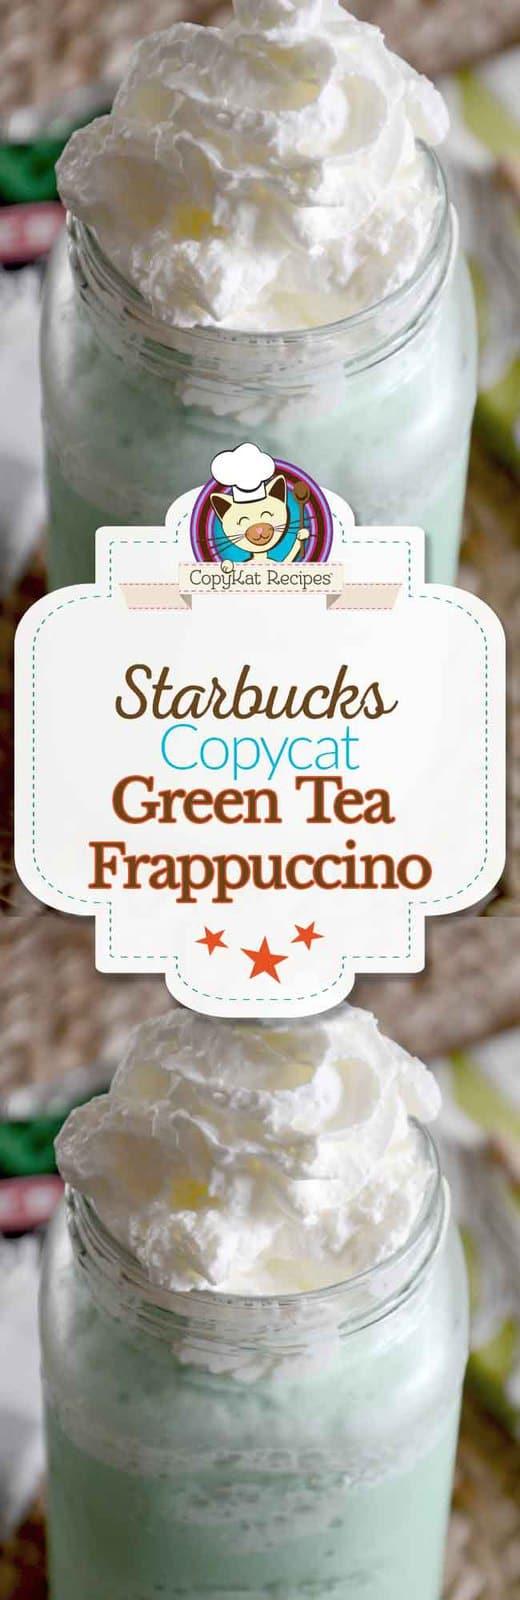 You can make a copycat recipe for the Starbucks Green Tea Frappuccino.